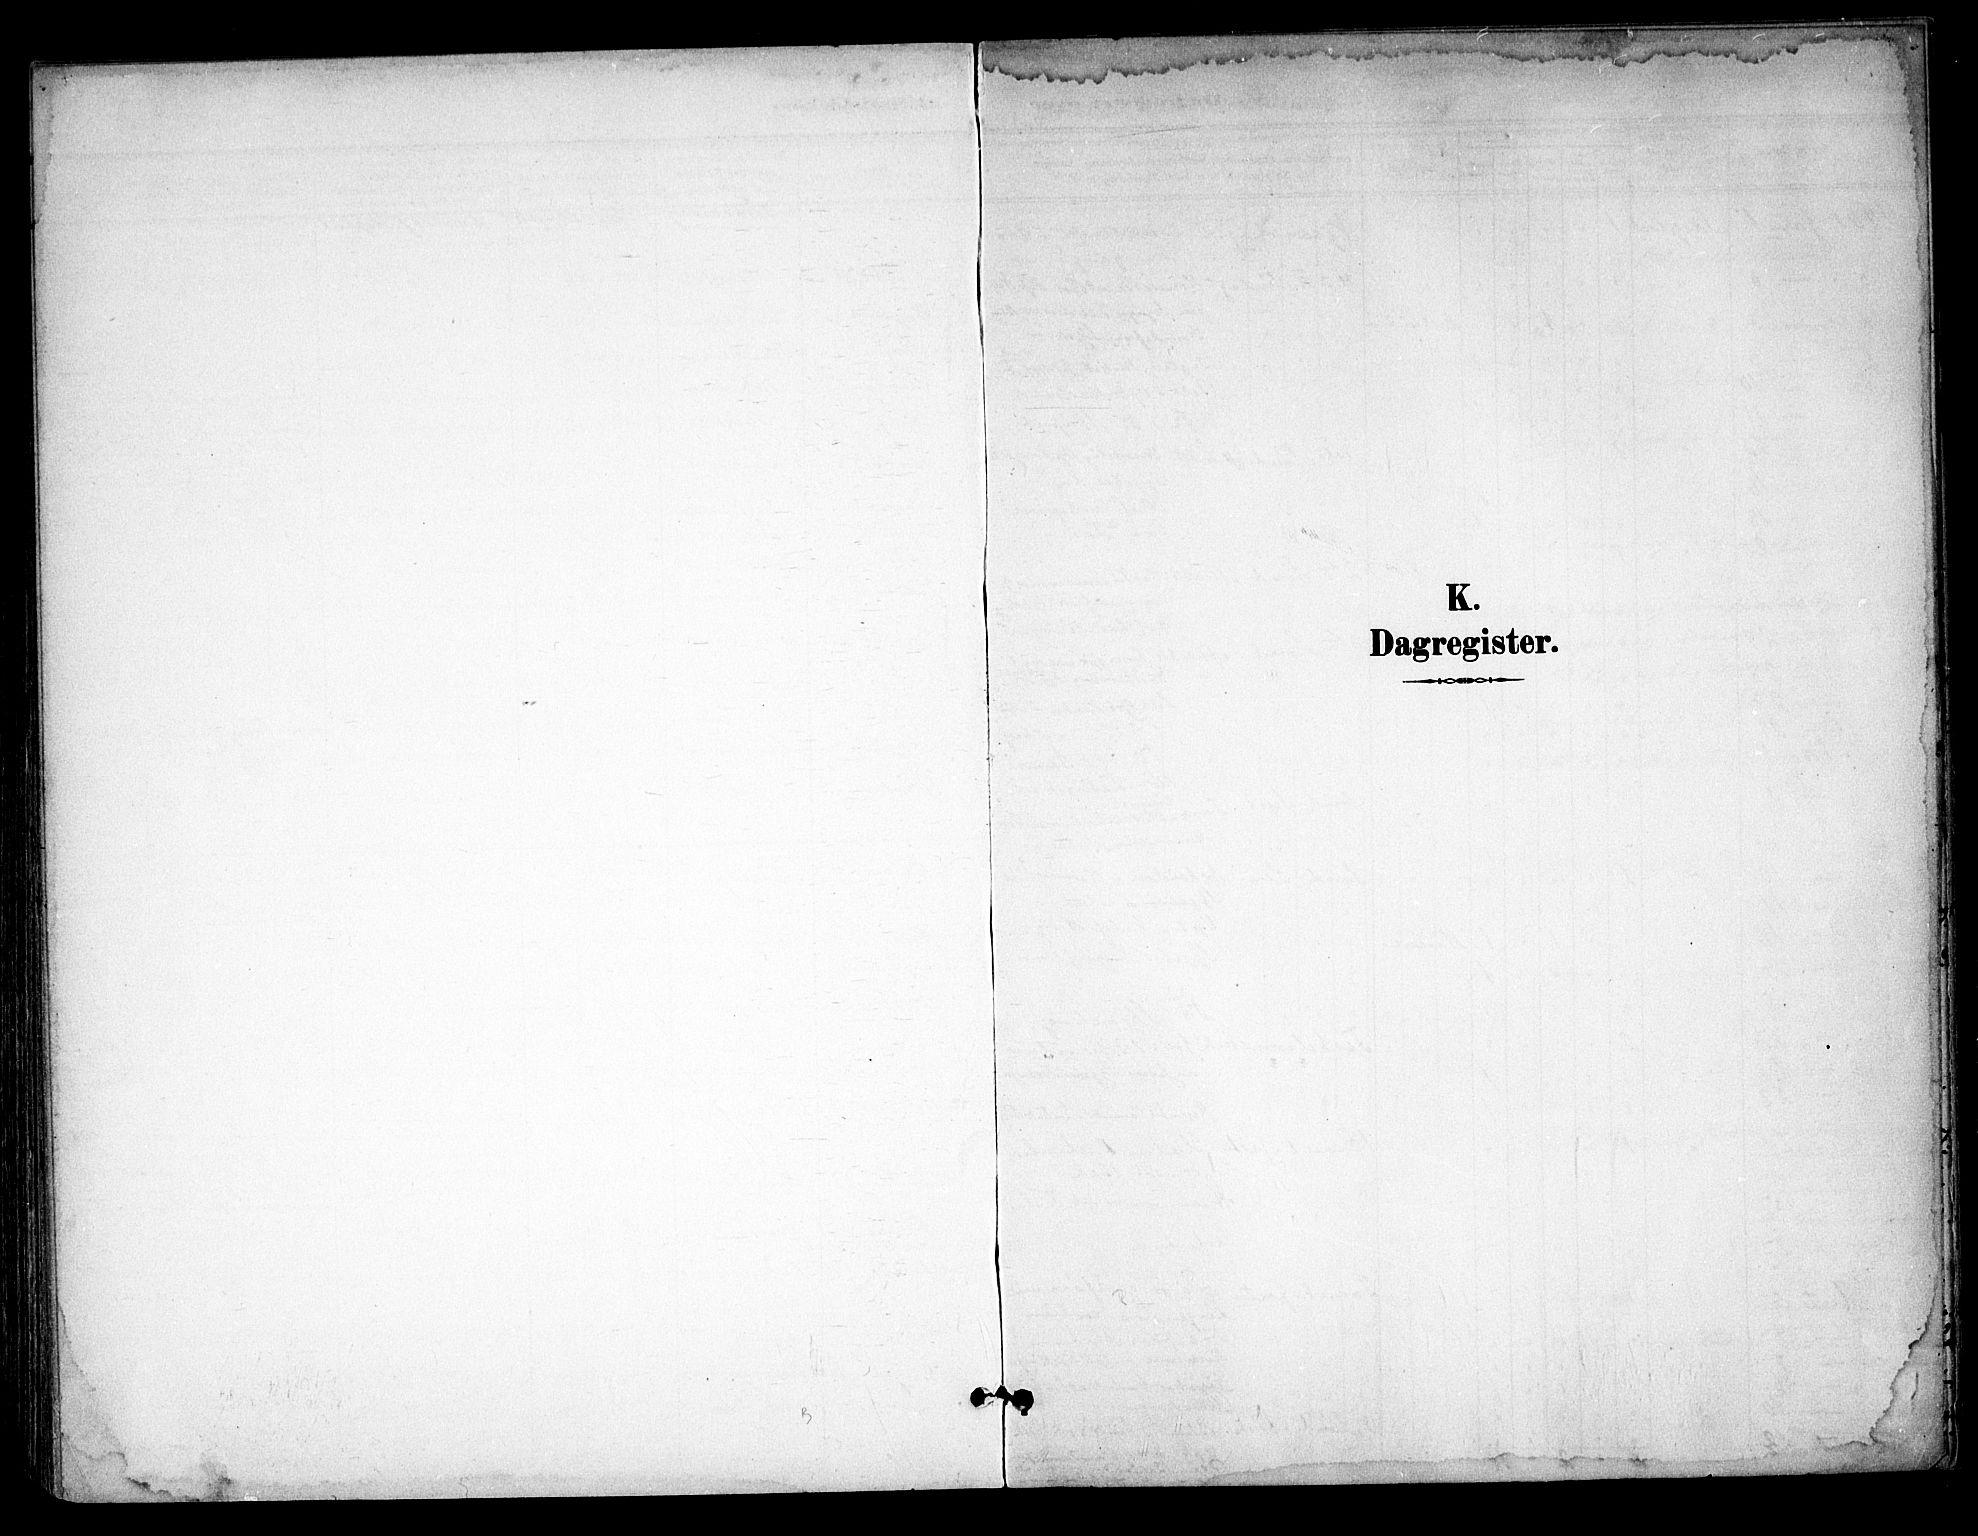 SAO, Skiptvet prestekontor Kirkebøker, F/Fa/L0011: Ministerialbok nr. 11, 1901-1913